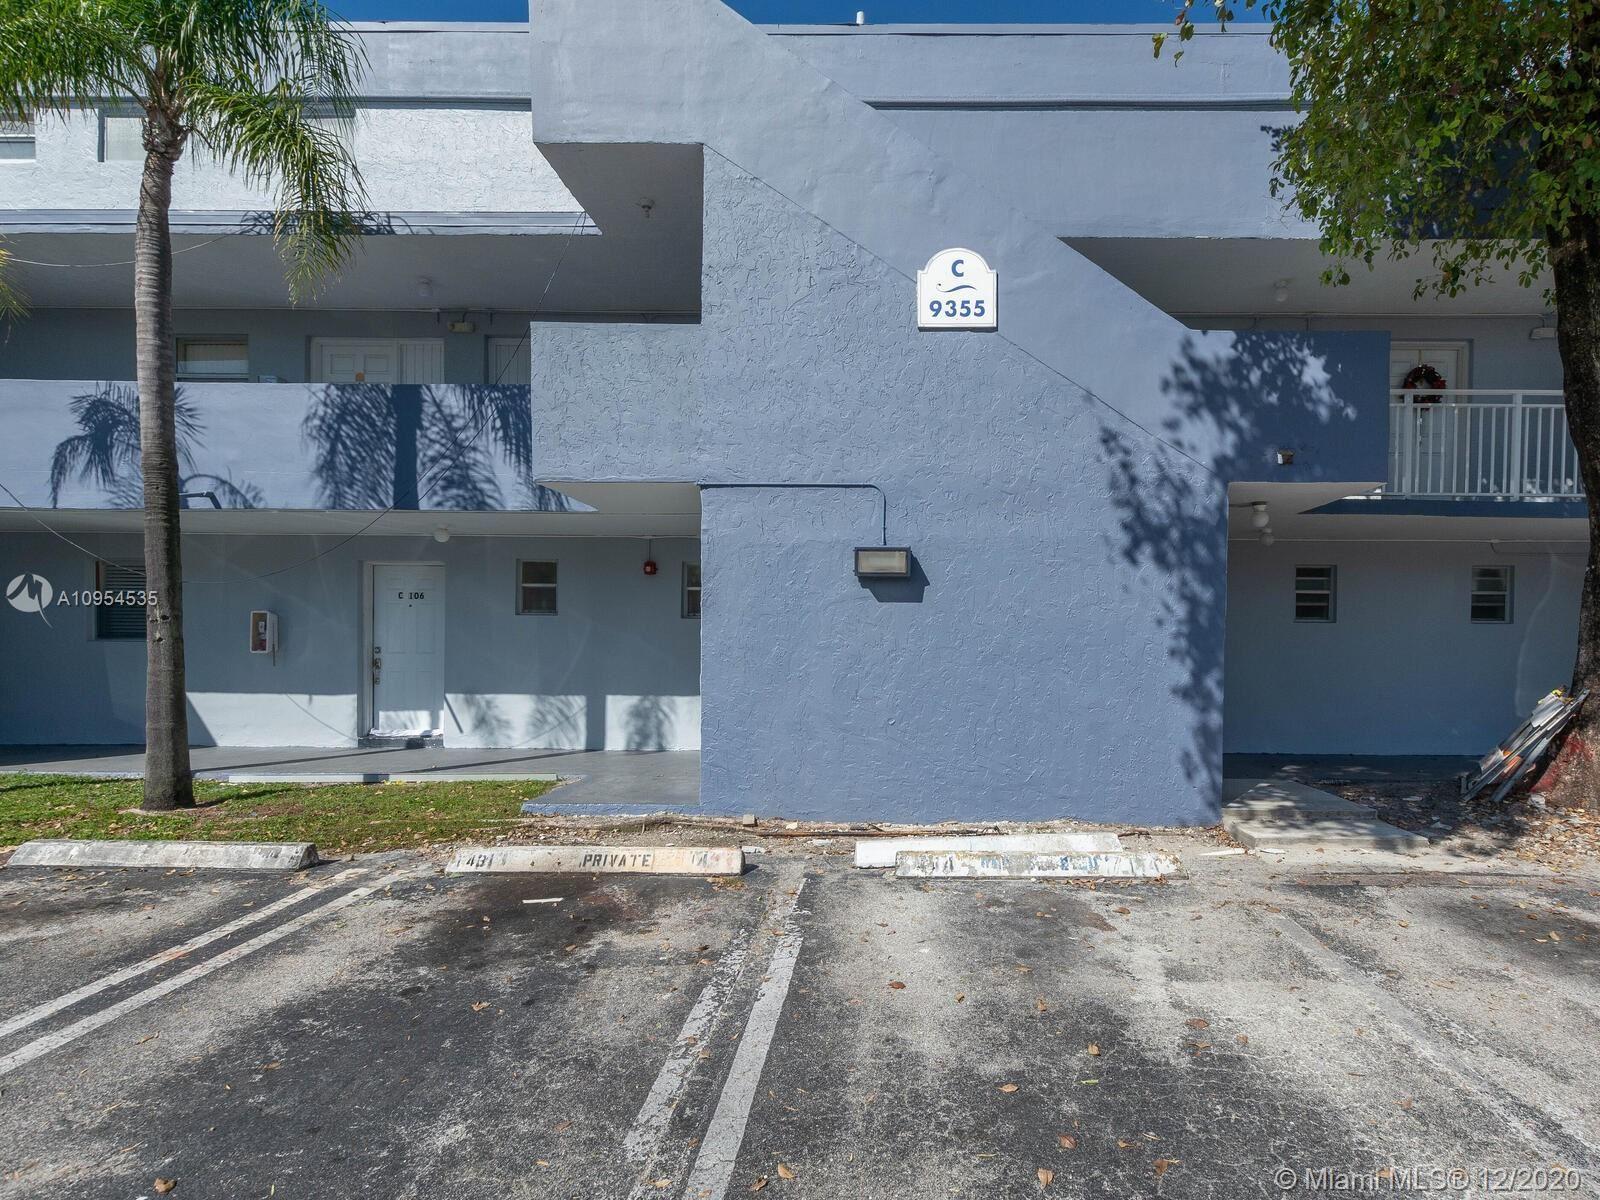 9355 Fontainebleau Blvd #C201, Miami, FL 33172 - #: A10954535